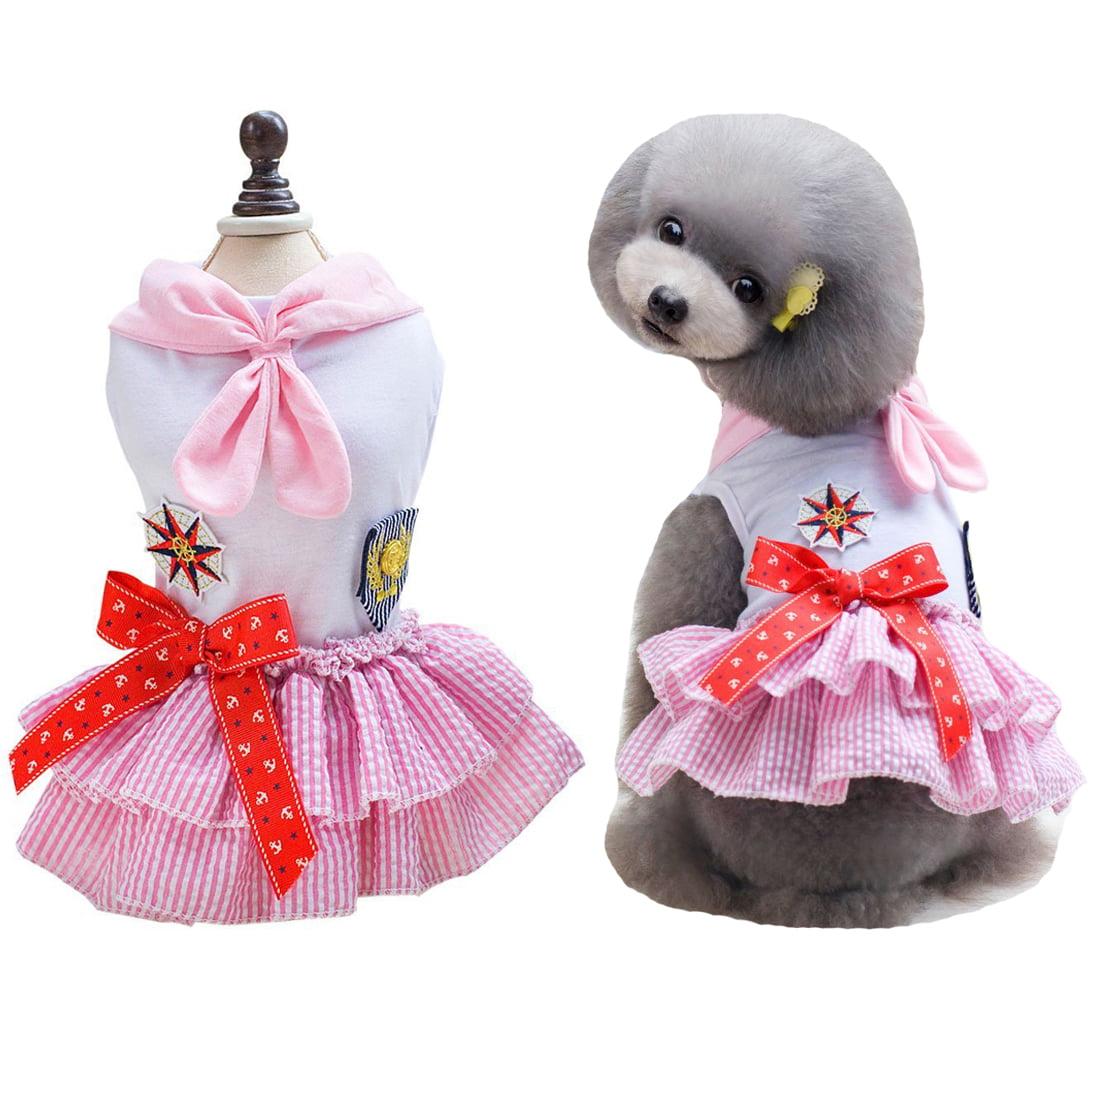 Classic Sailor Dog Skirt Small Pet Cat Tutu Dresses Puppy Clothes Costumes